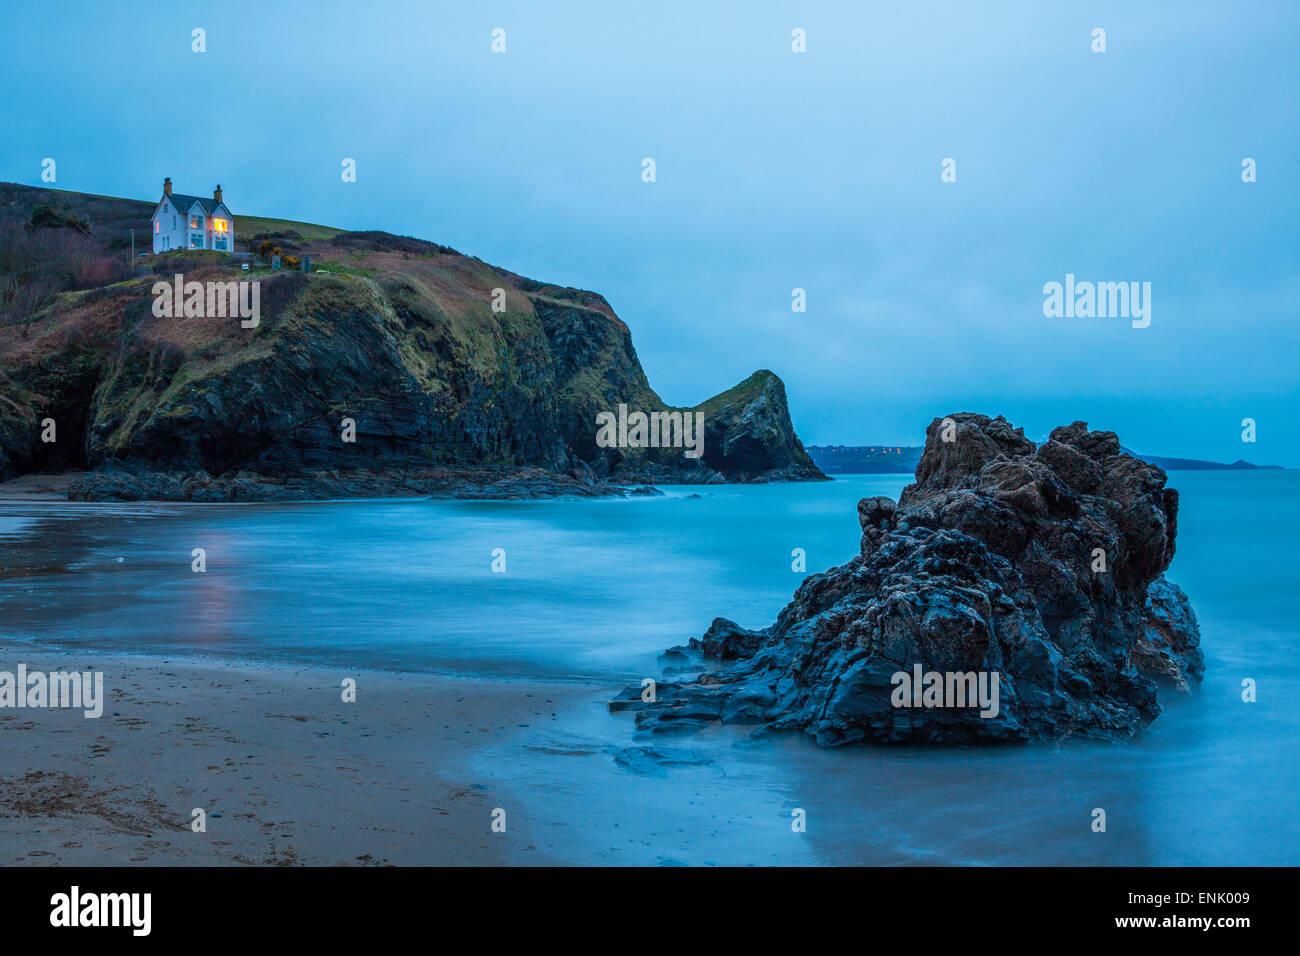 Llangrannog Beach, Ceredigion (Cardigan), West Wales, Wales, United Kingdom, Europe - Stock Image